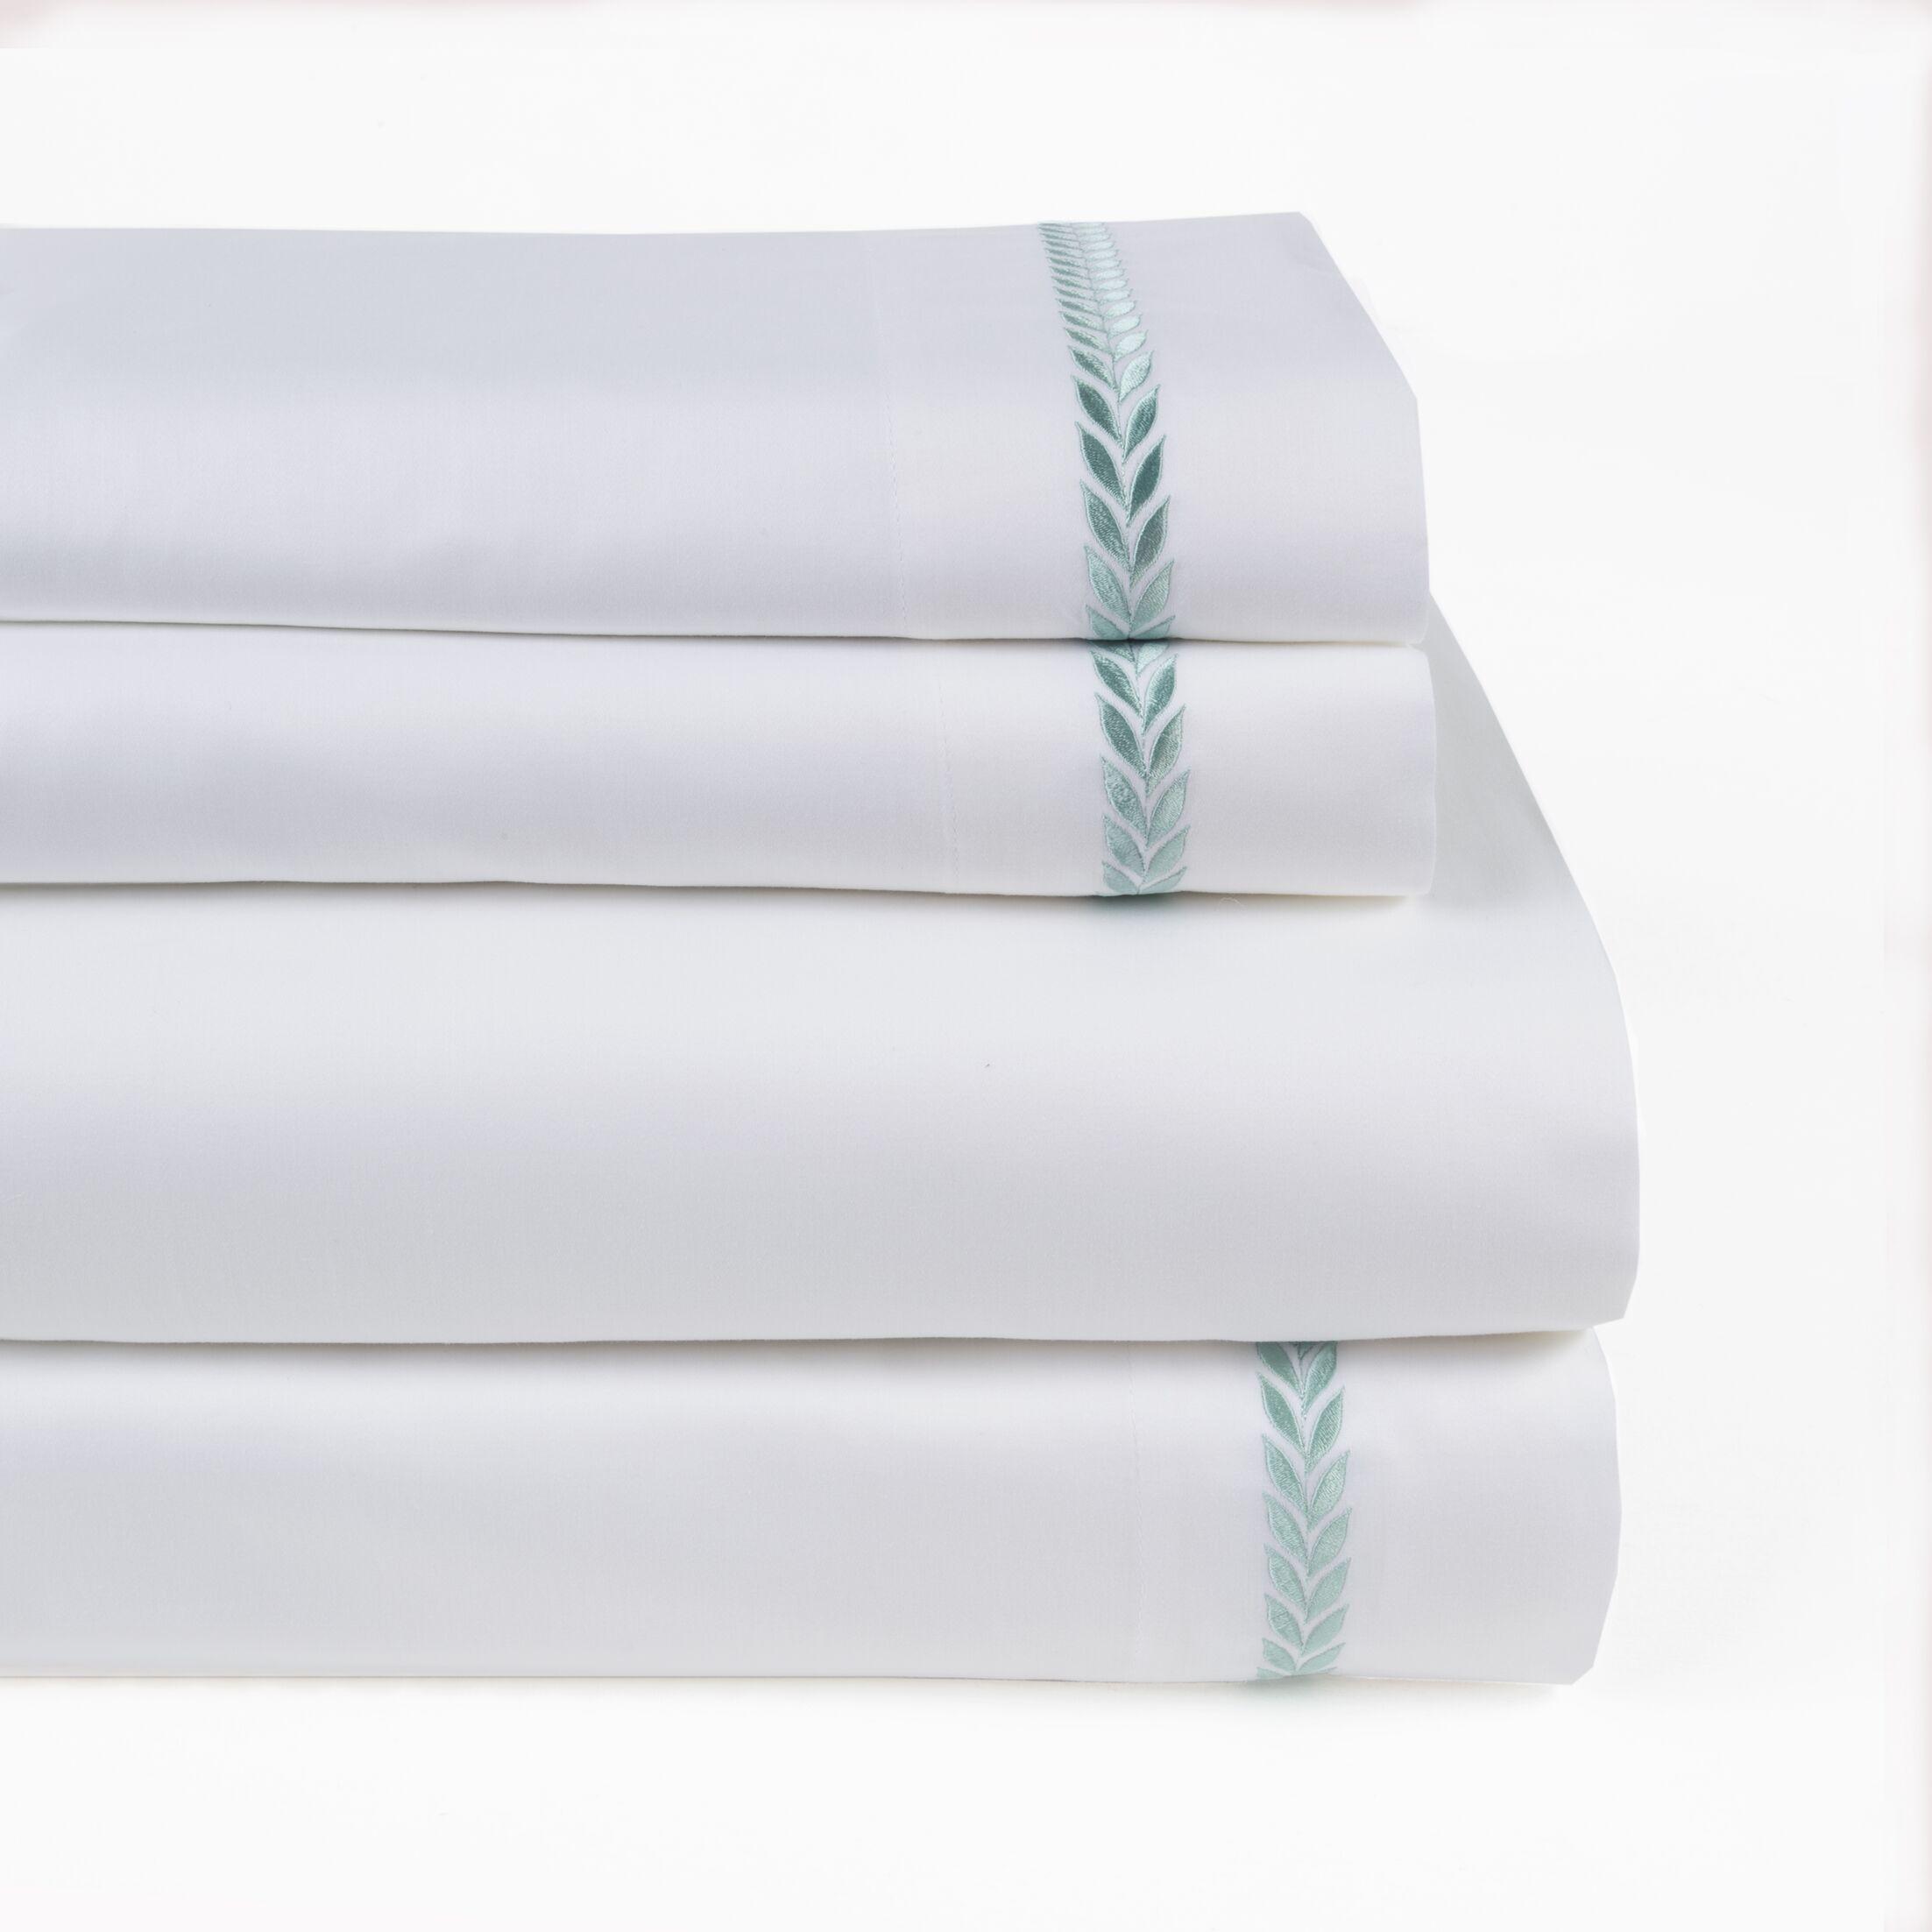 Proctor Leaf Embroidered 300 Thread Count 100% Cotton Sheet Set Size: King, Color: Mint